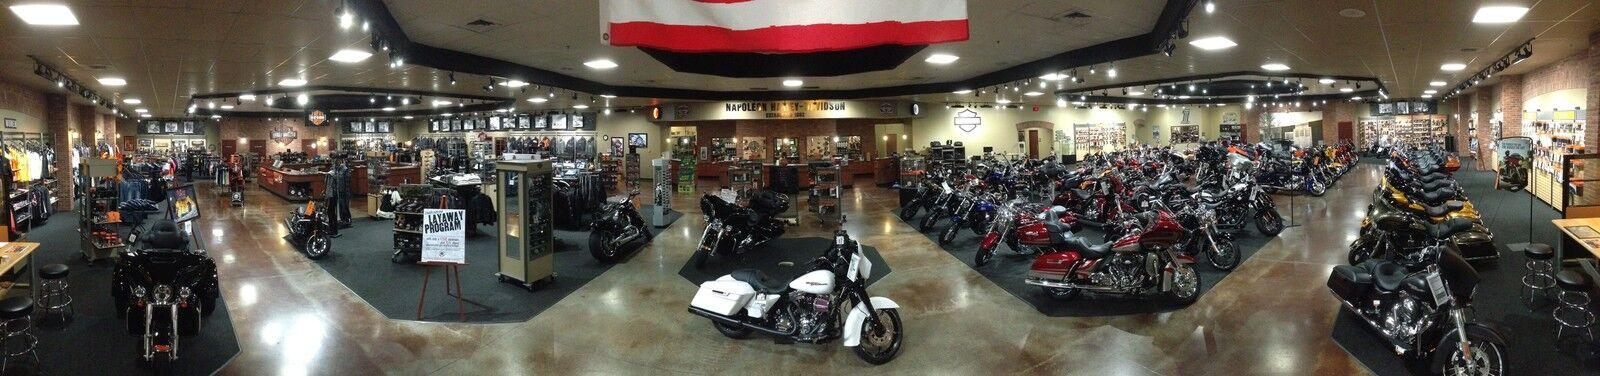 Harley-Davidson Sales and Service